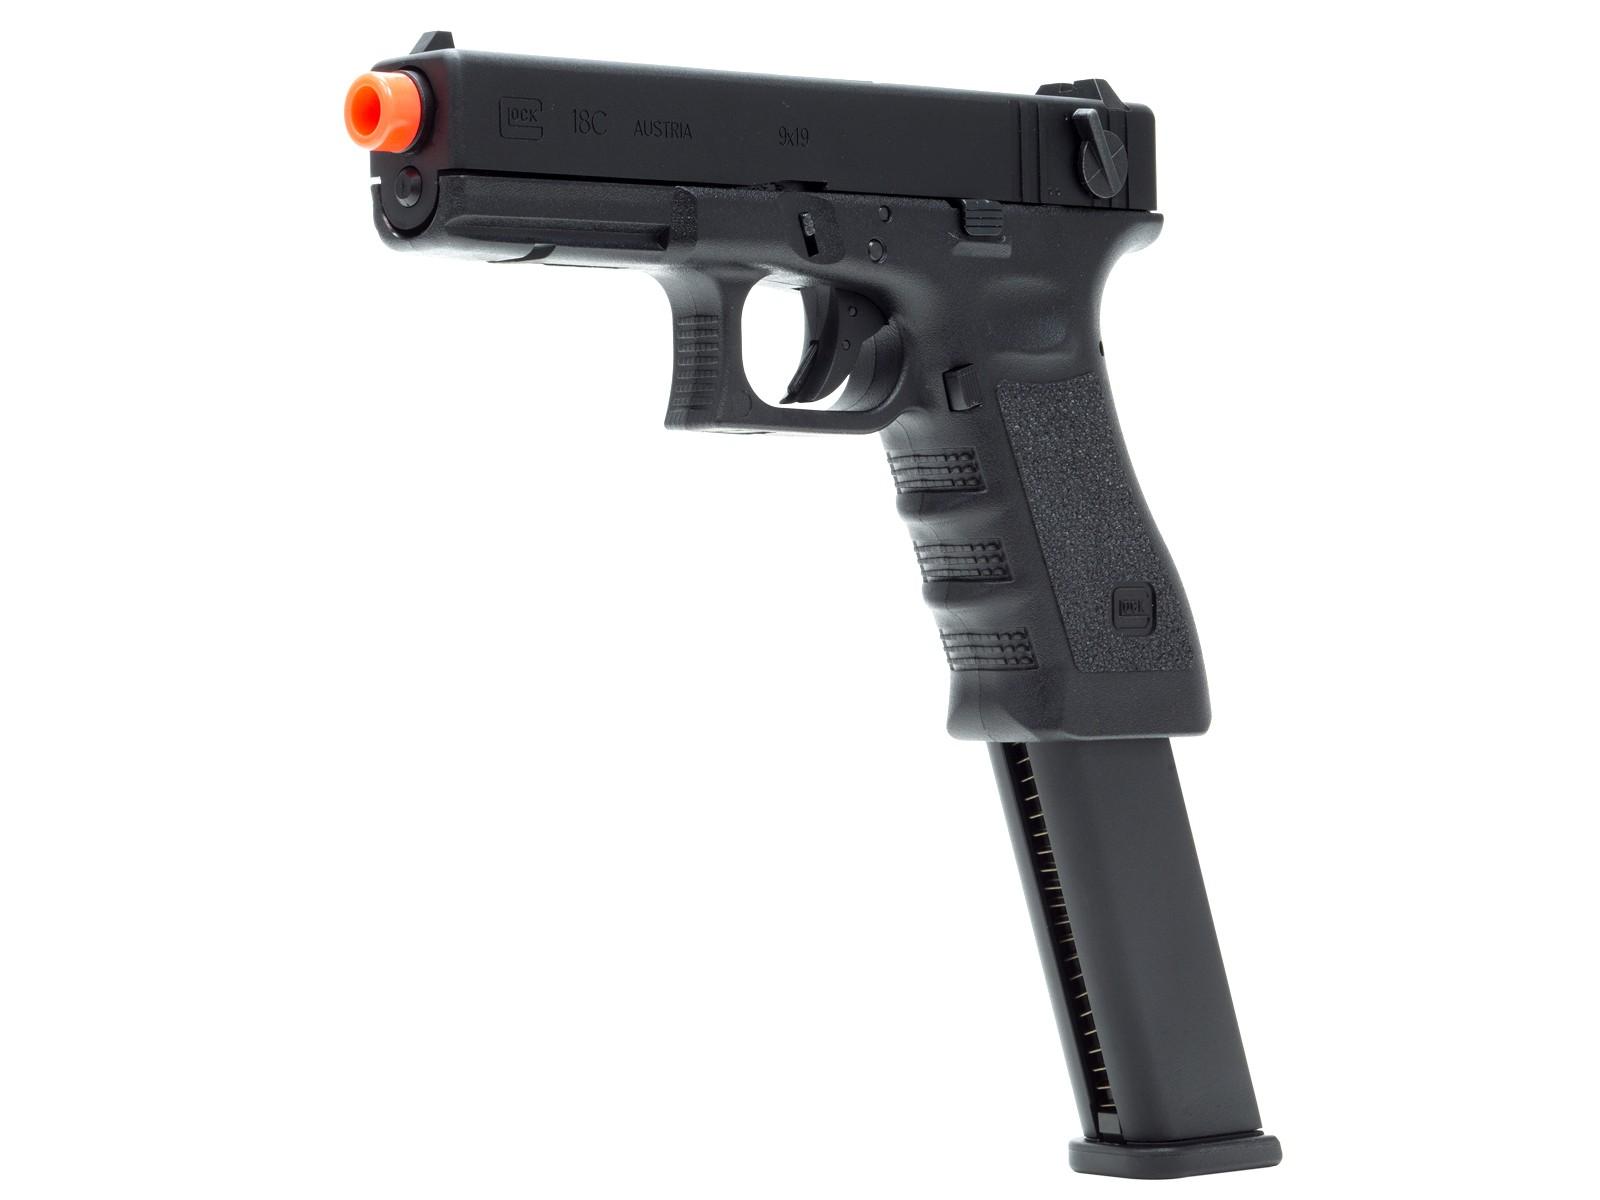 GLOCK G18C Gen3 GBB Airsoft Pistol, Extended Mag